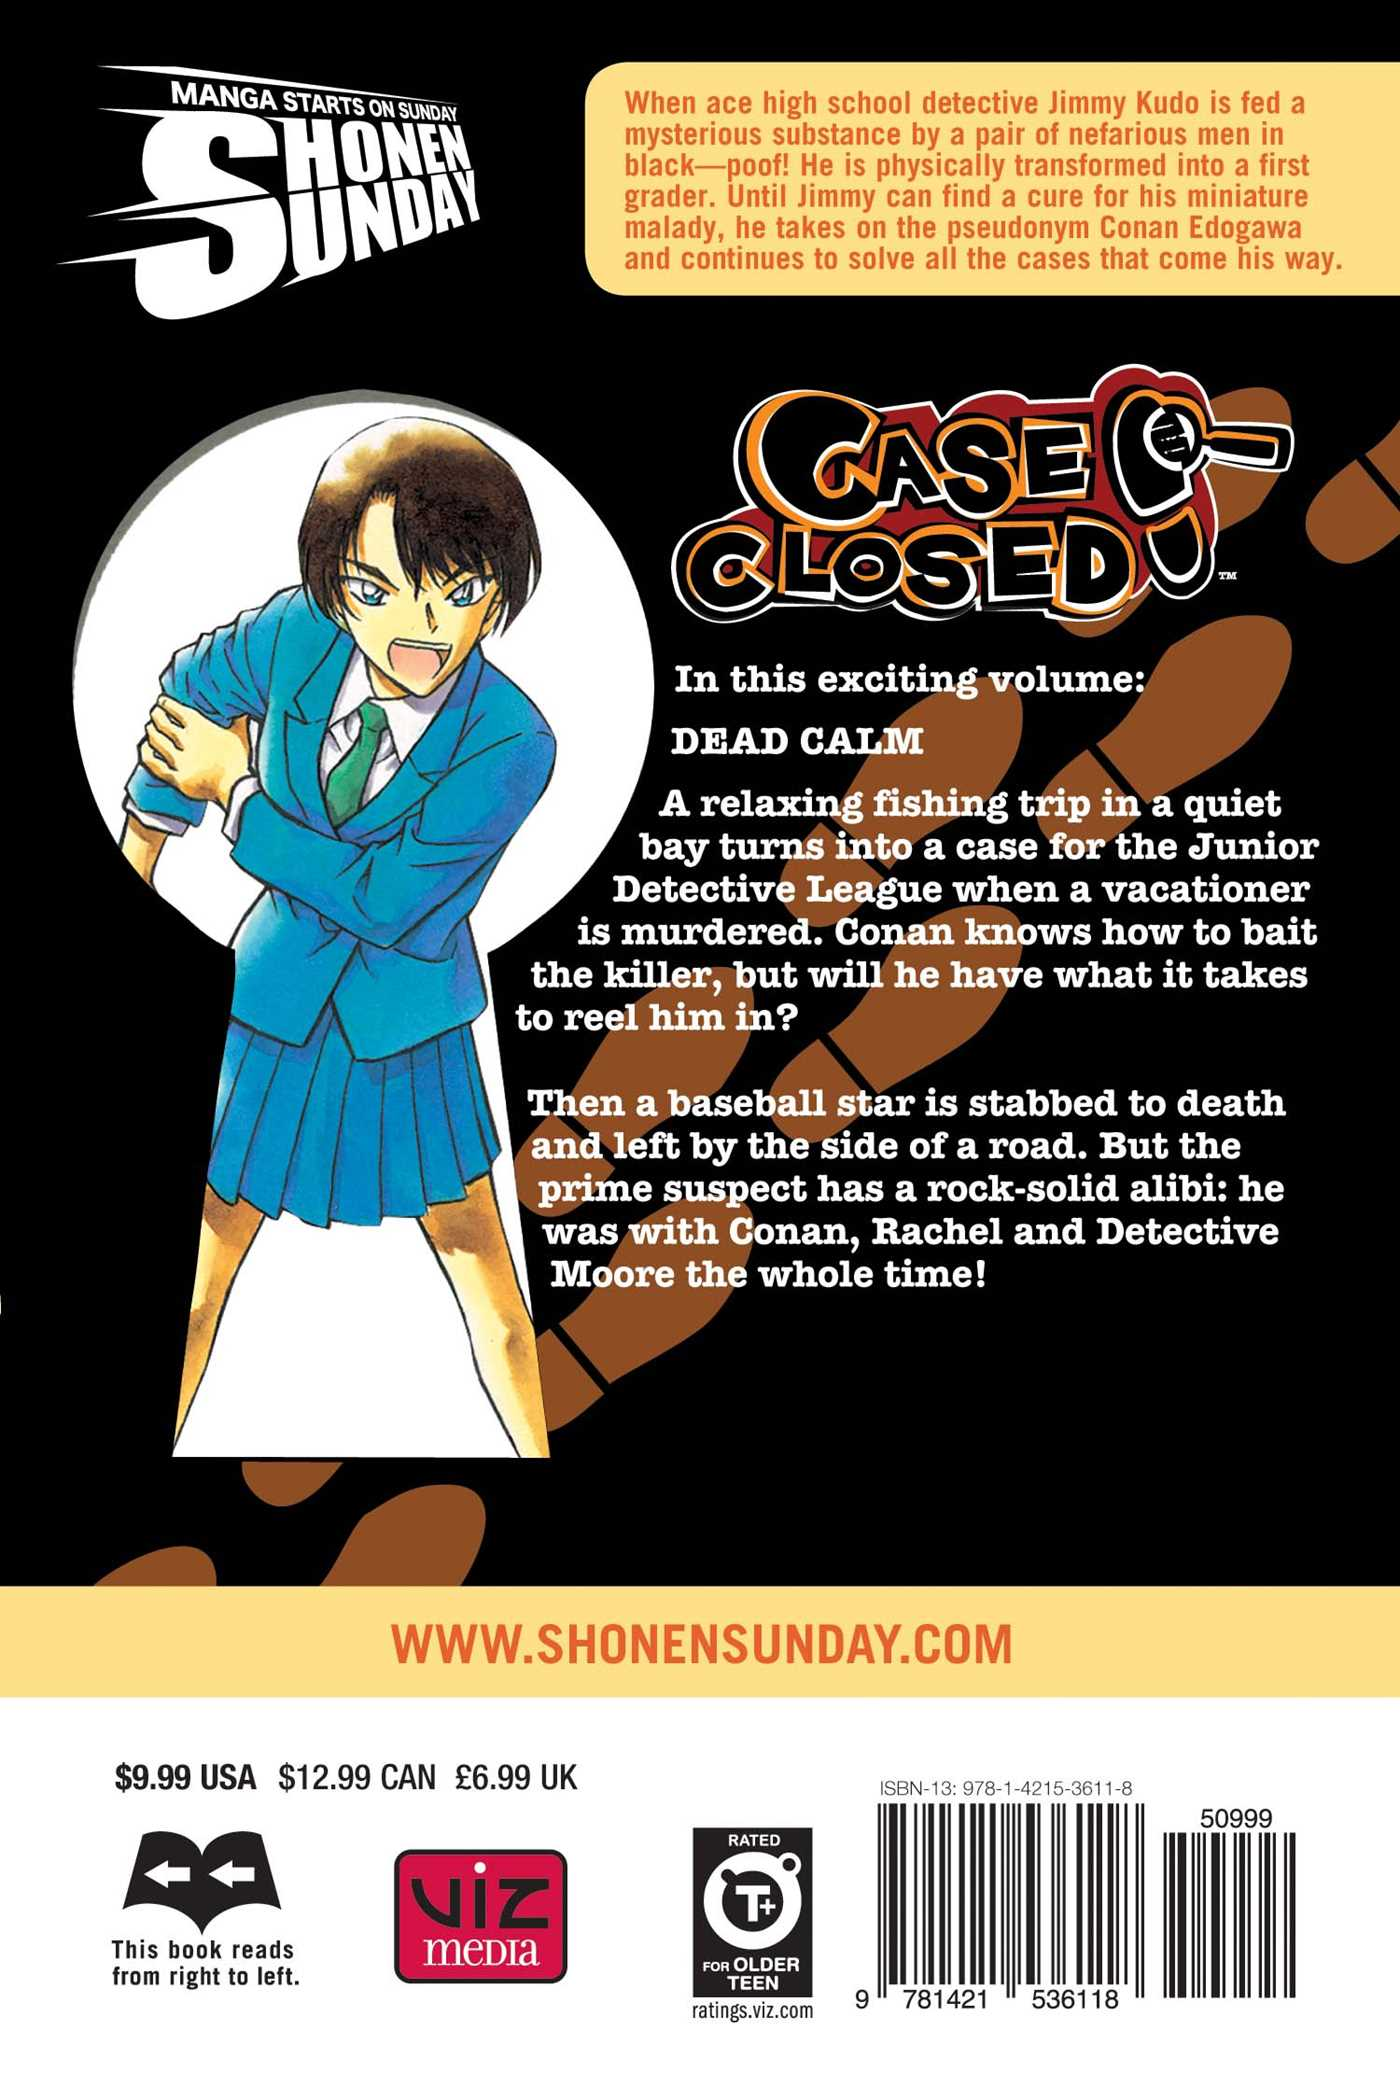 Case closed vol 45 9781421536118 hr back